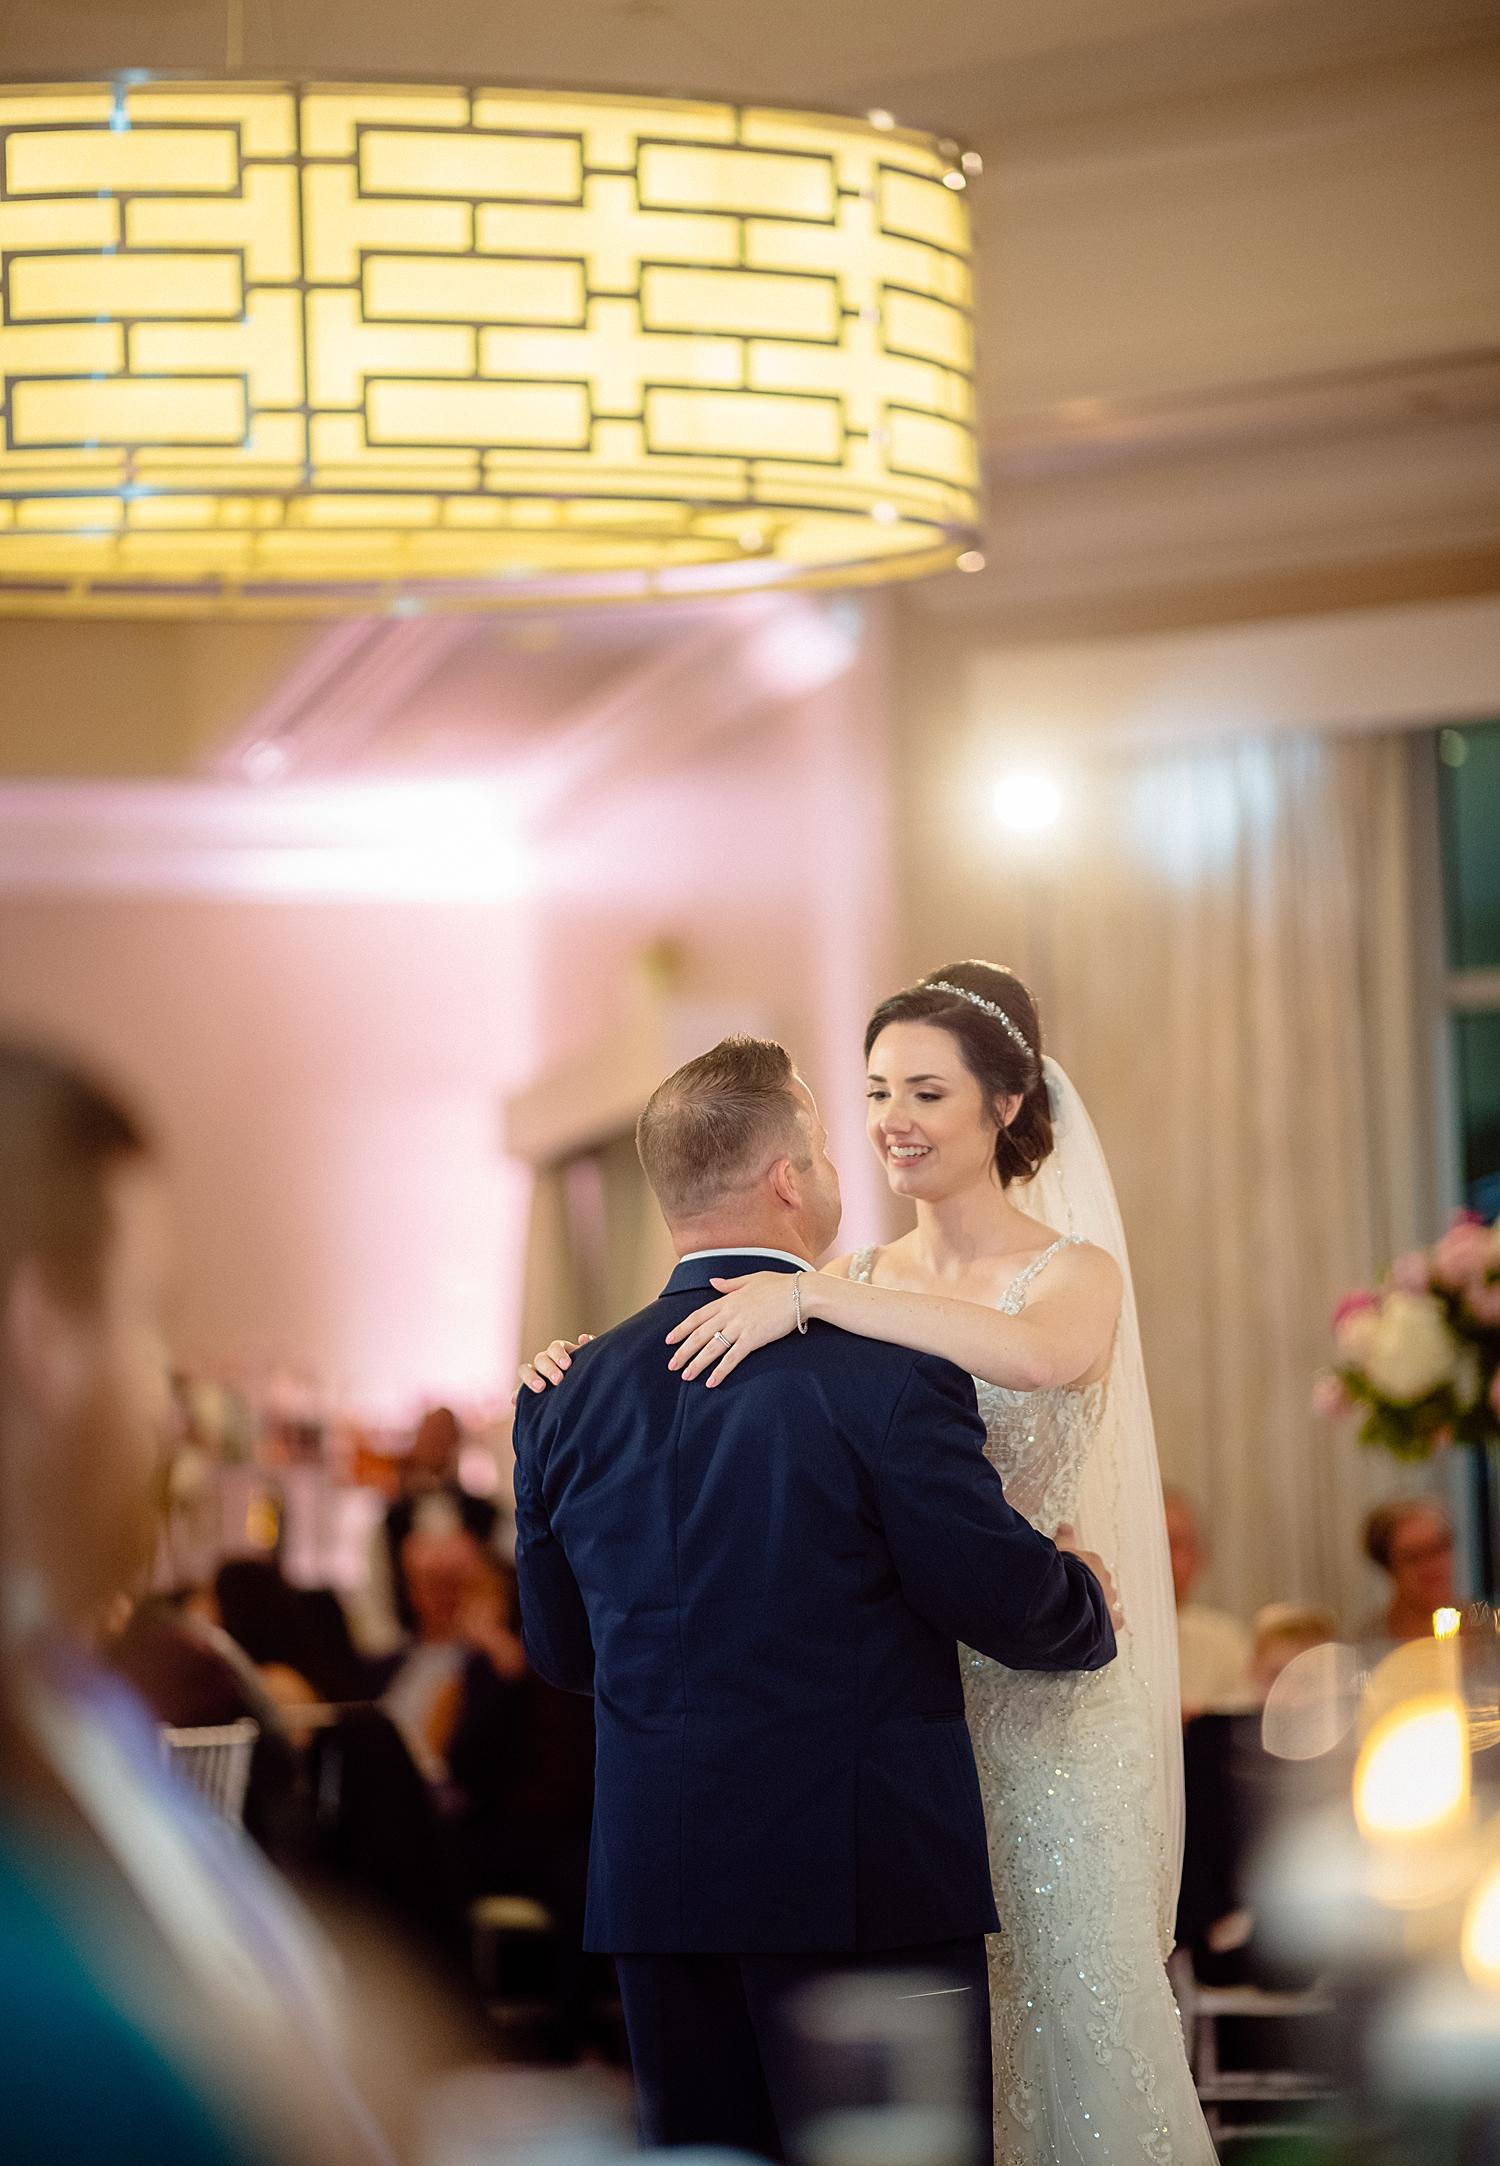 Matt Steeves Photography Luxury Fort Myers Weddings Kelly McWilliams Sanibel Island Photographer Signature Floral_0074.jpg